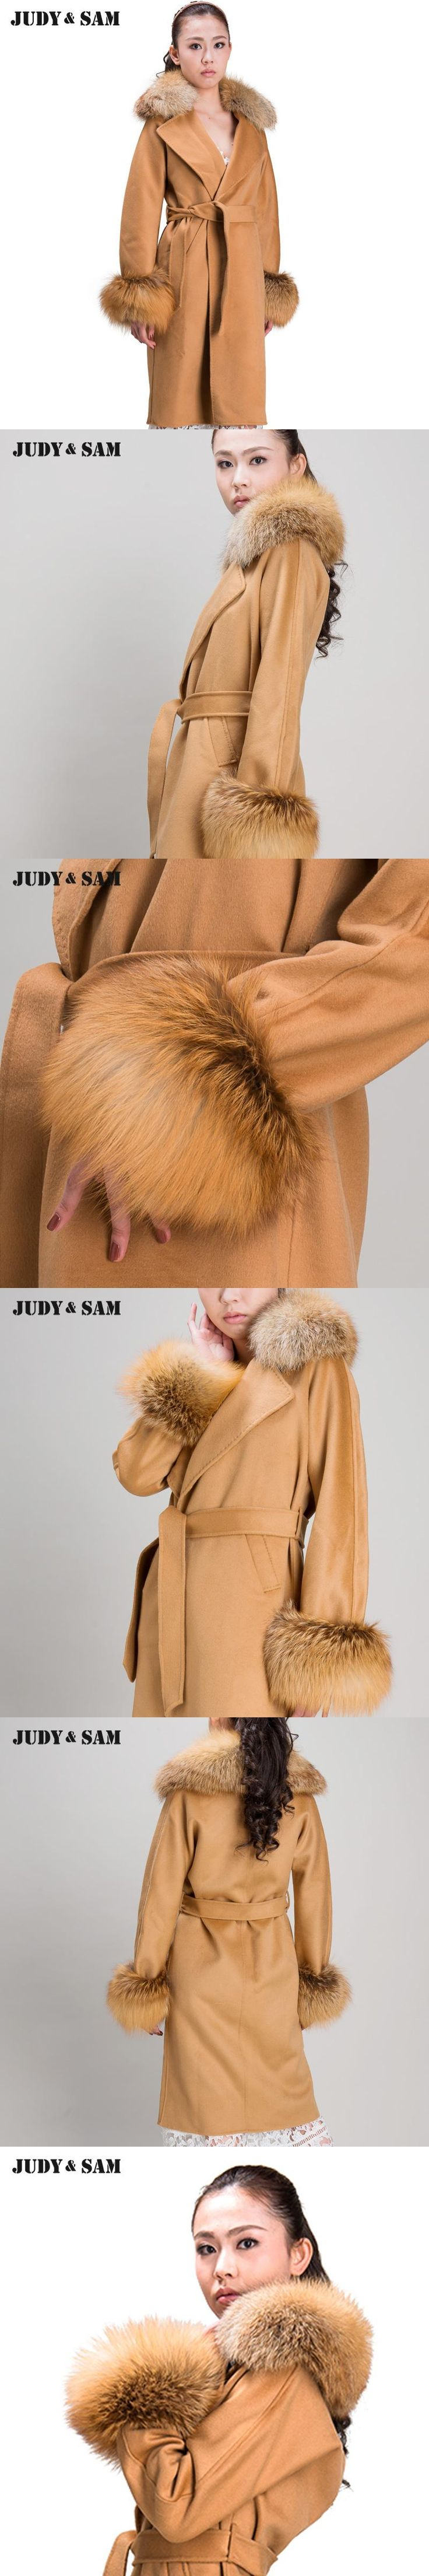 Turn-Down Collar Topcoat Free DHL Long Woolen Red Fox Collar Cuff Leisure Women Coat For Winter Female Fur Wool Outwear